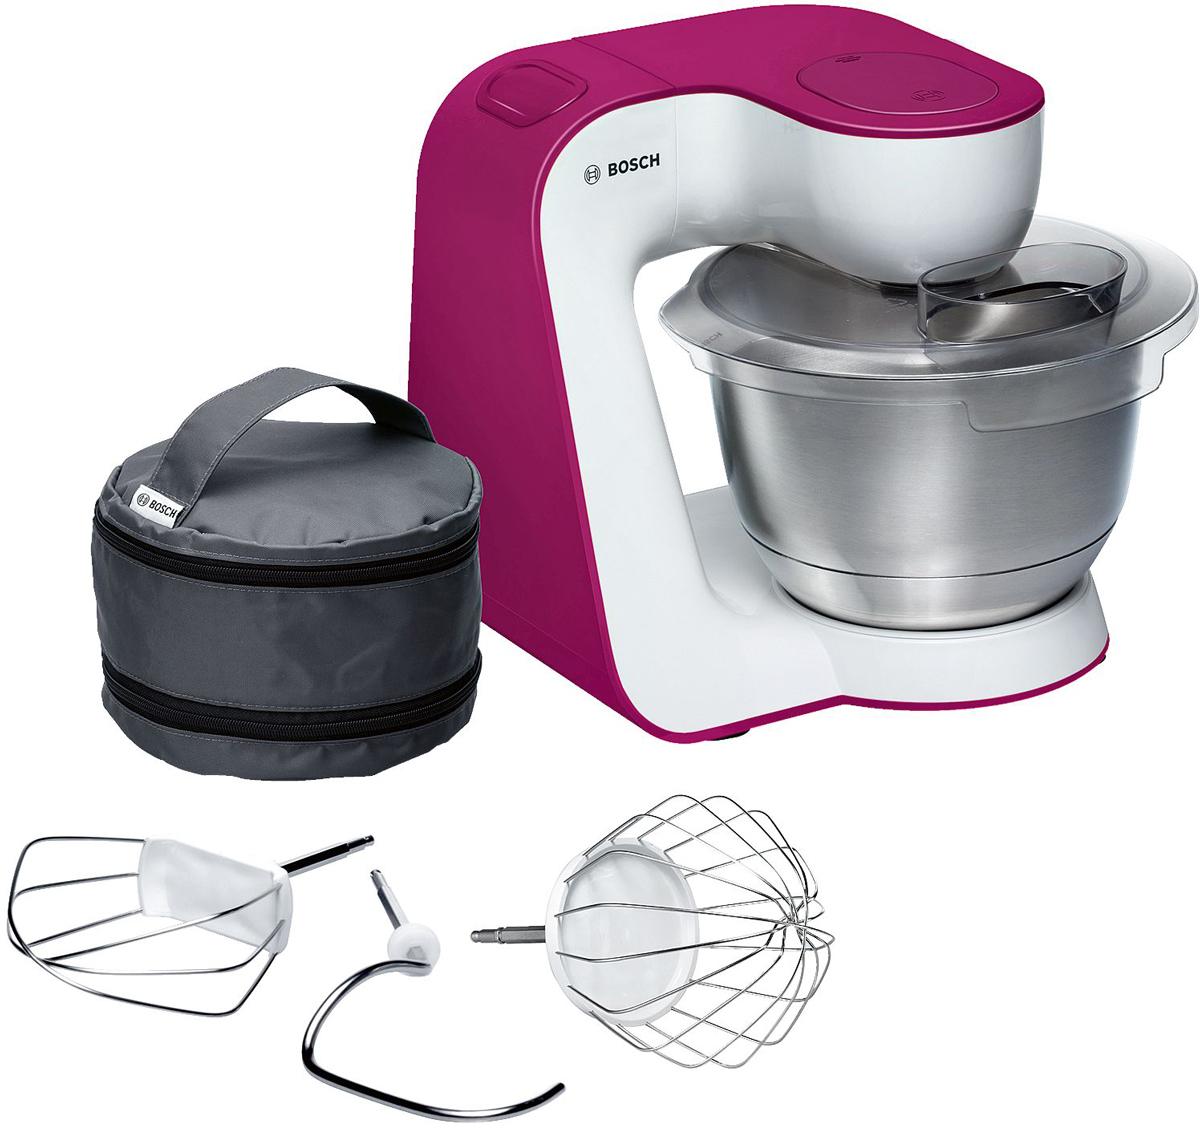 Bosch MUM54P00 кухонный комбайн - Комбайны и мясорубки